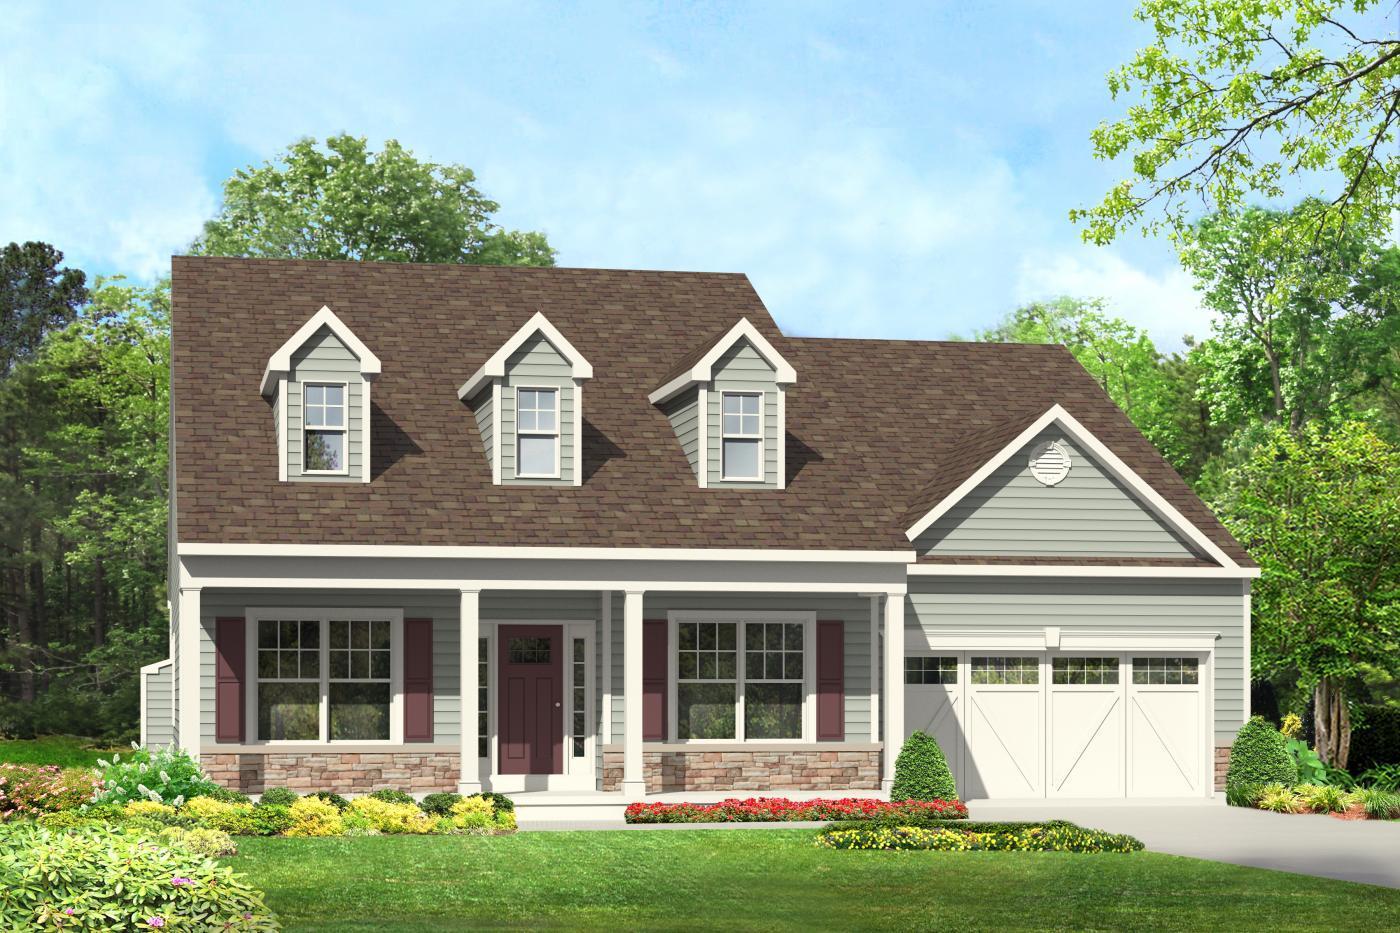 Single Family for Sale at Maple Shade Estates (Bethlehem Twp) - Oakmont 3796 Bethman Road Easton, Pennsylvania 18045 United States